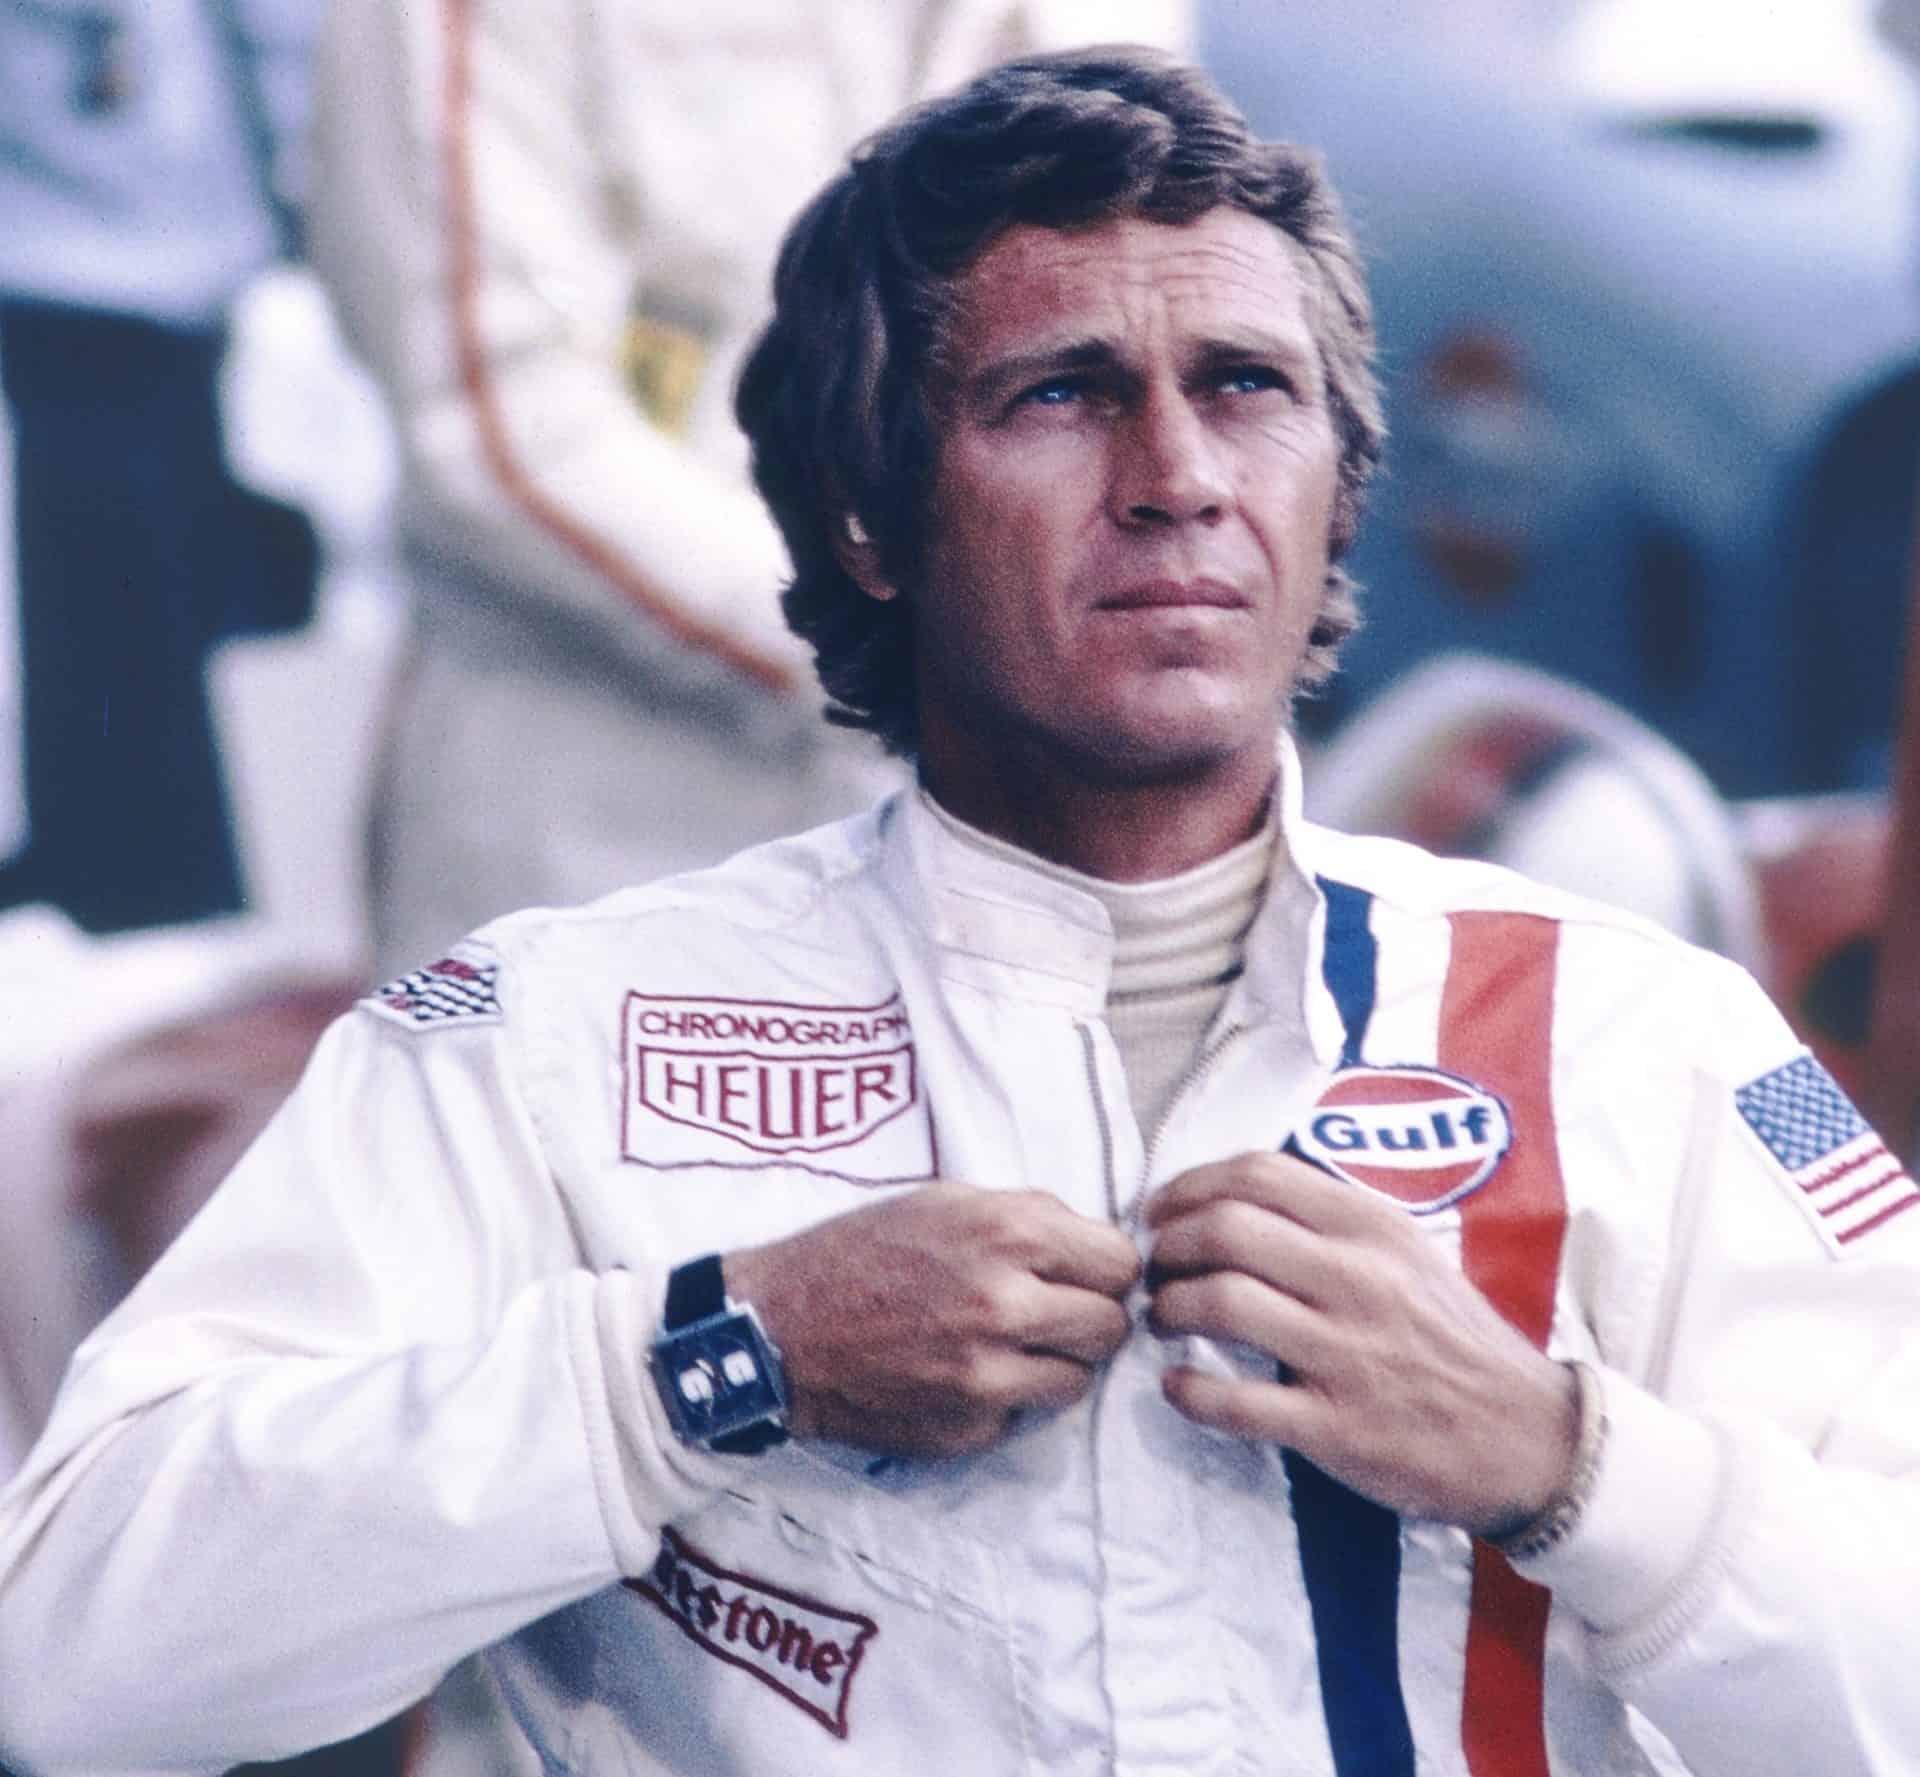 Steve McQueen und TAG Heuer MonacoWie die TAG Heuer Monaco ans Handgelenk von Steve McQueen fand